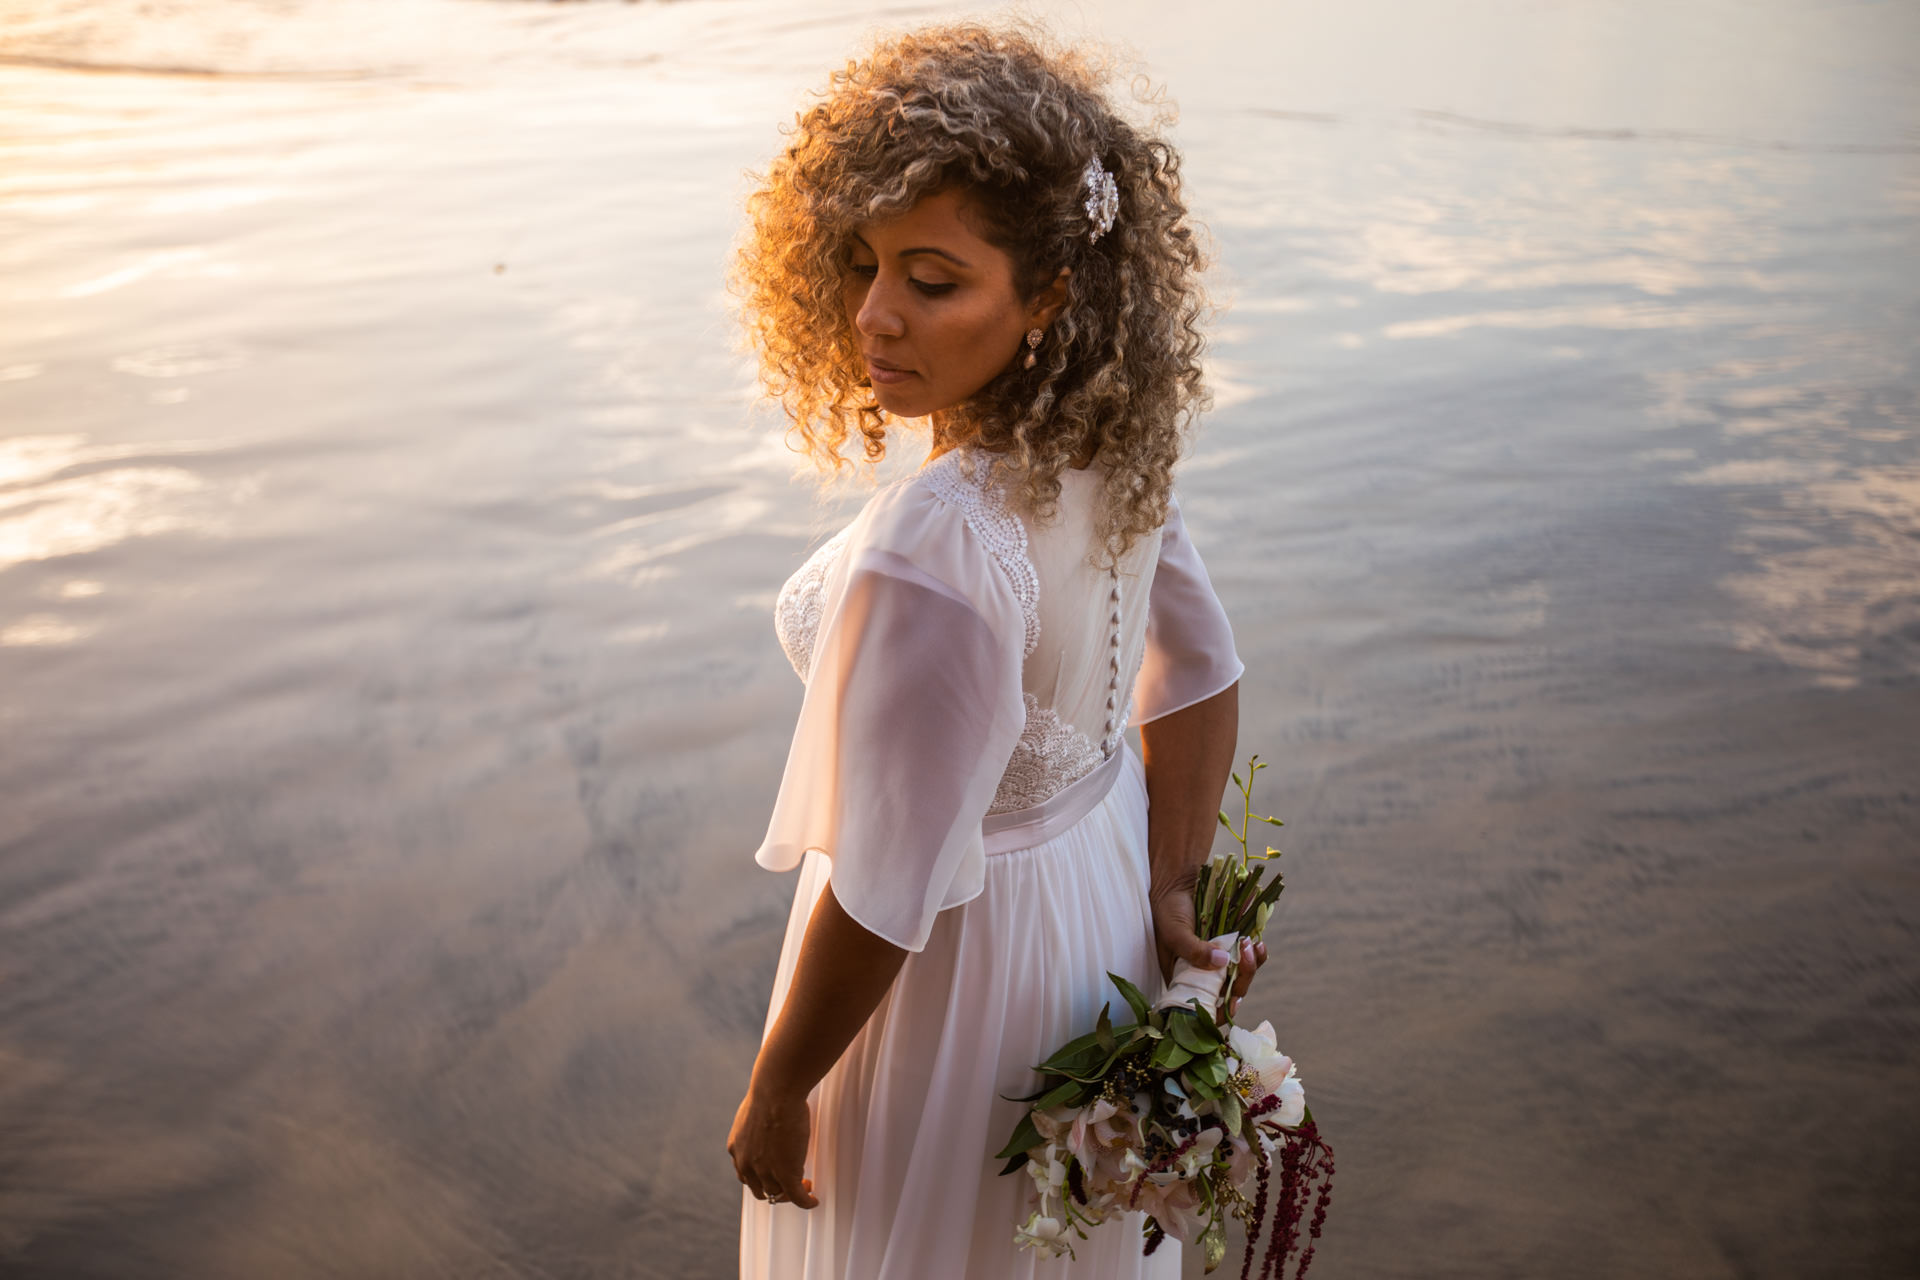 Gerusa Bridal Portrait La Jolla San Diego Beach Wedding Sunset by Faces Photography